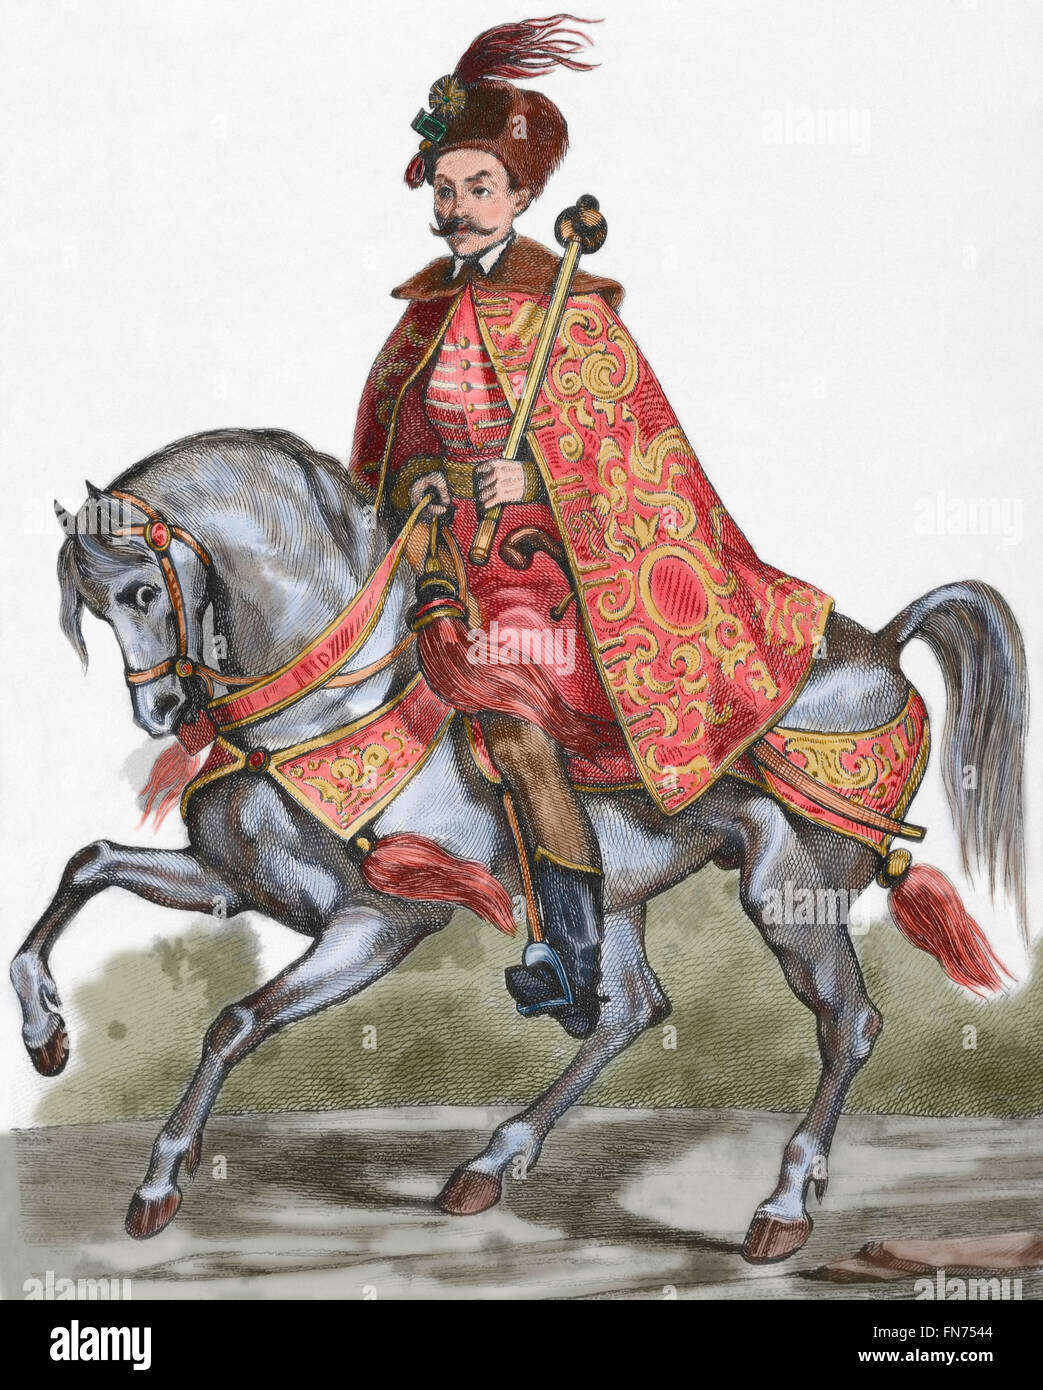 Aleksey Mikhailovich (1629-1676). Tsar of Russia (1645-1676). Equestrian portrait. Engraving. Colored. Stock Photo